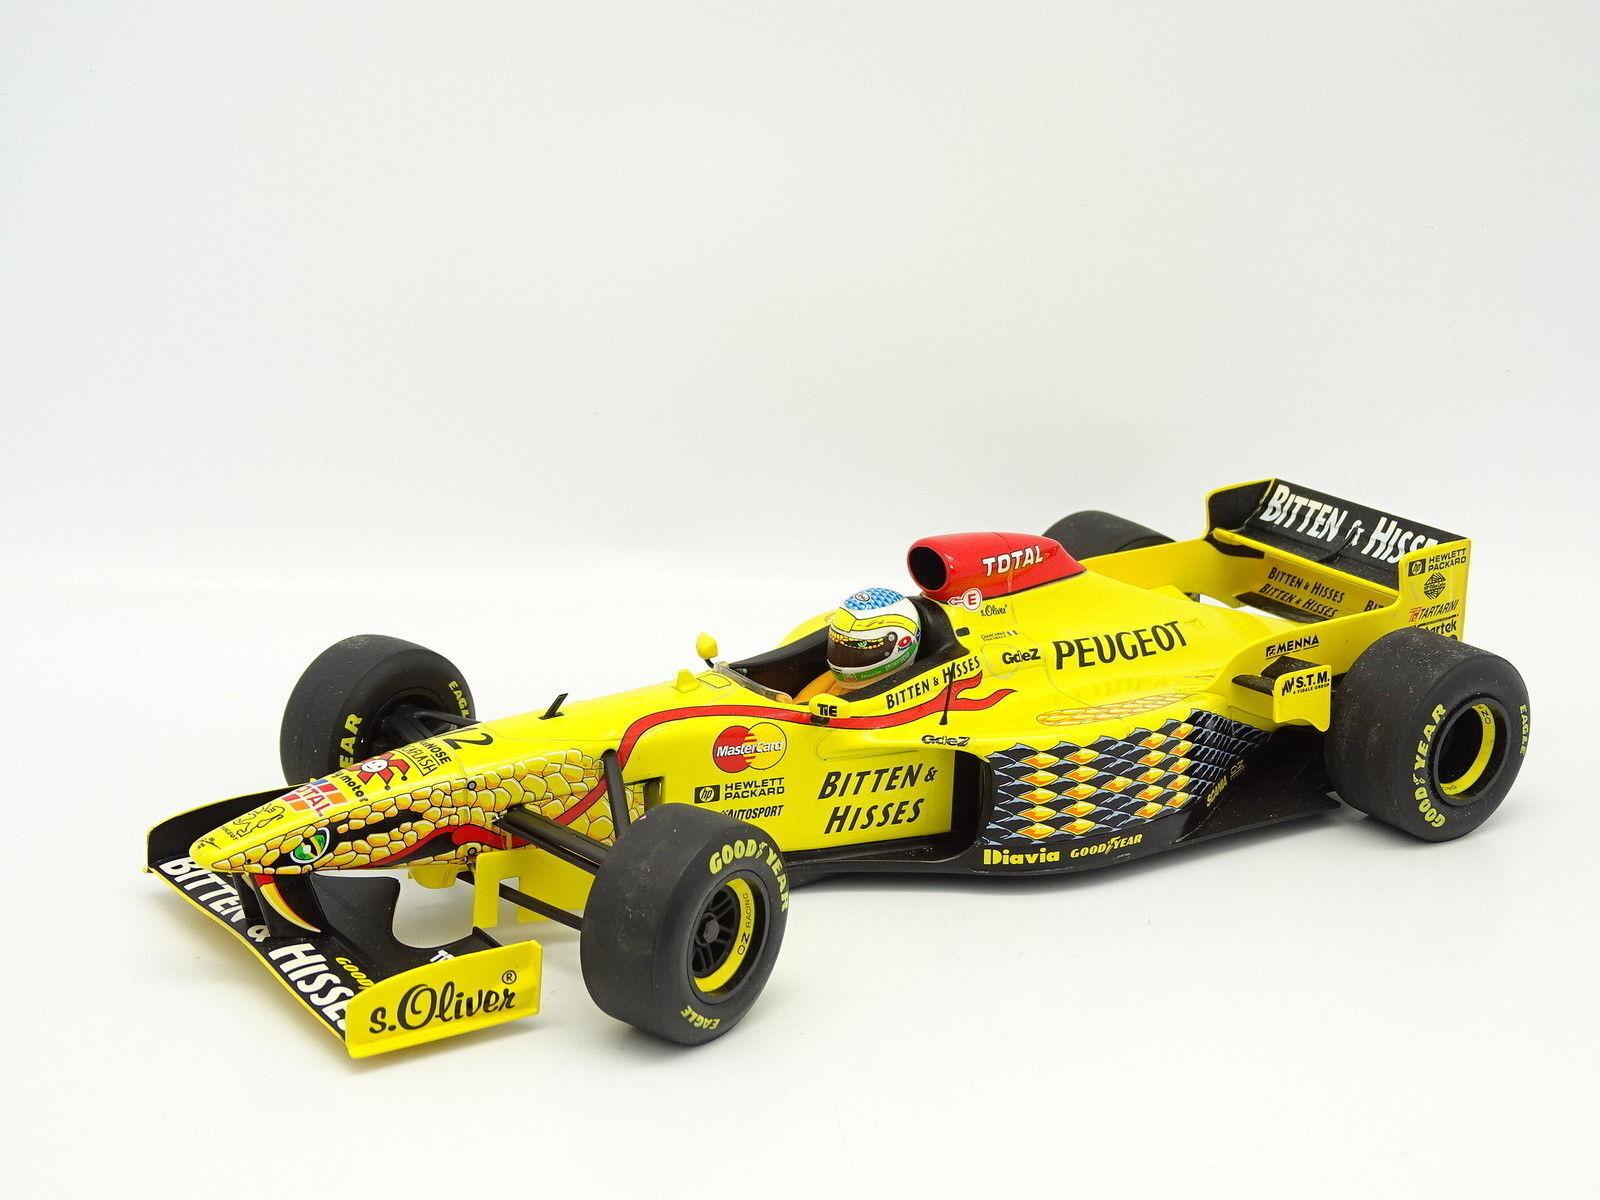 Minichamps 1 18 - F1 Jordan Peugeot 197 1997 Fisichella